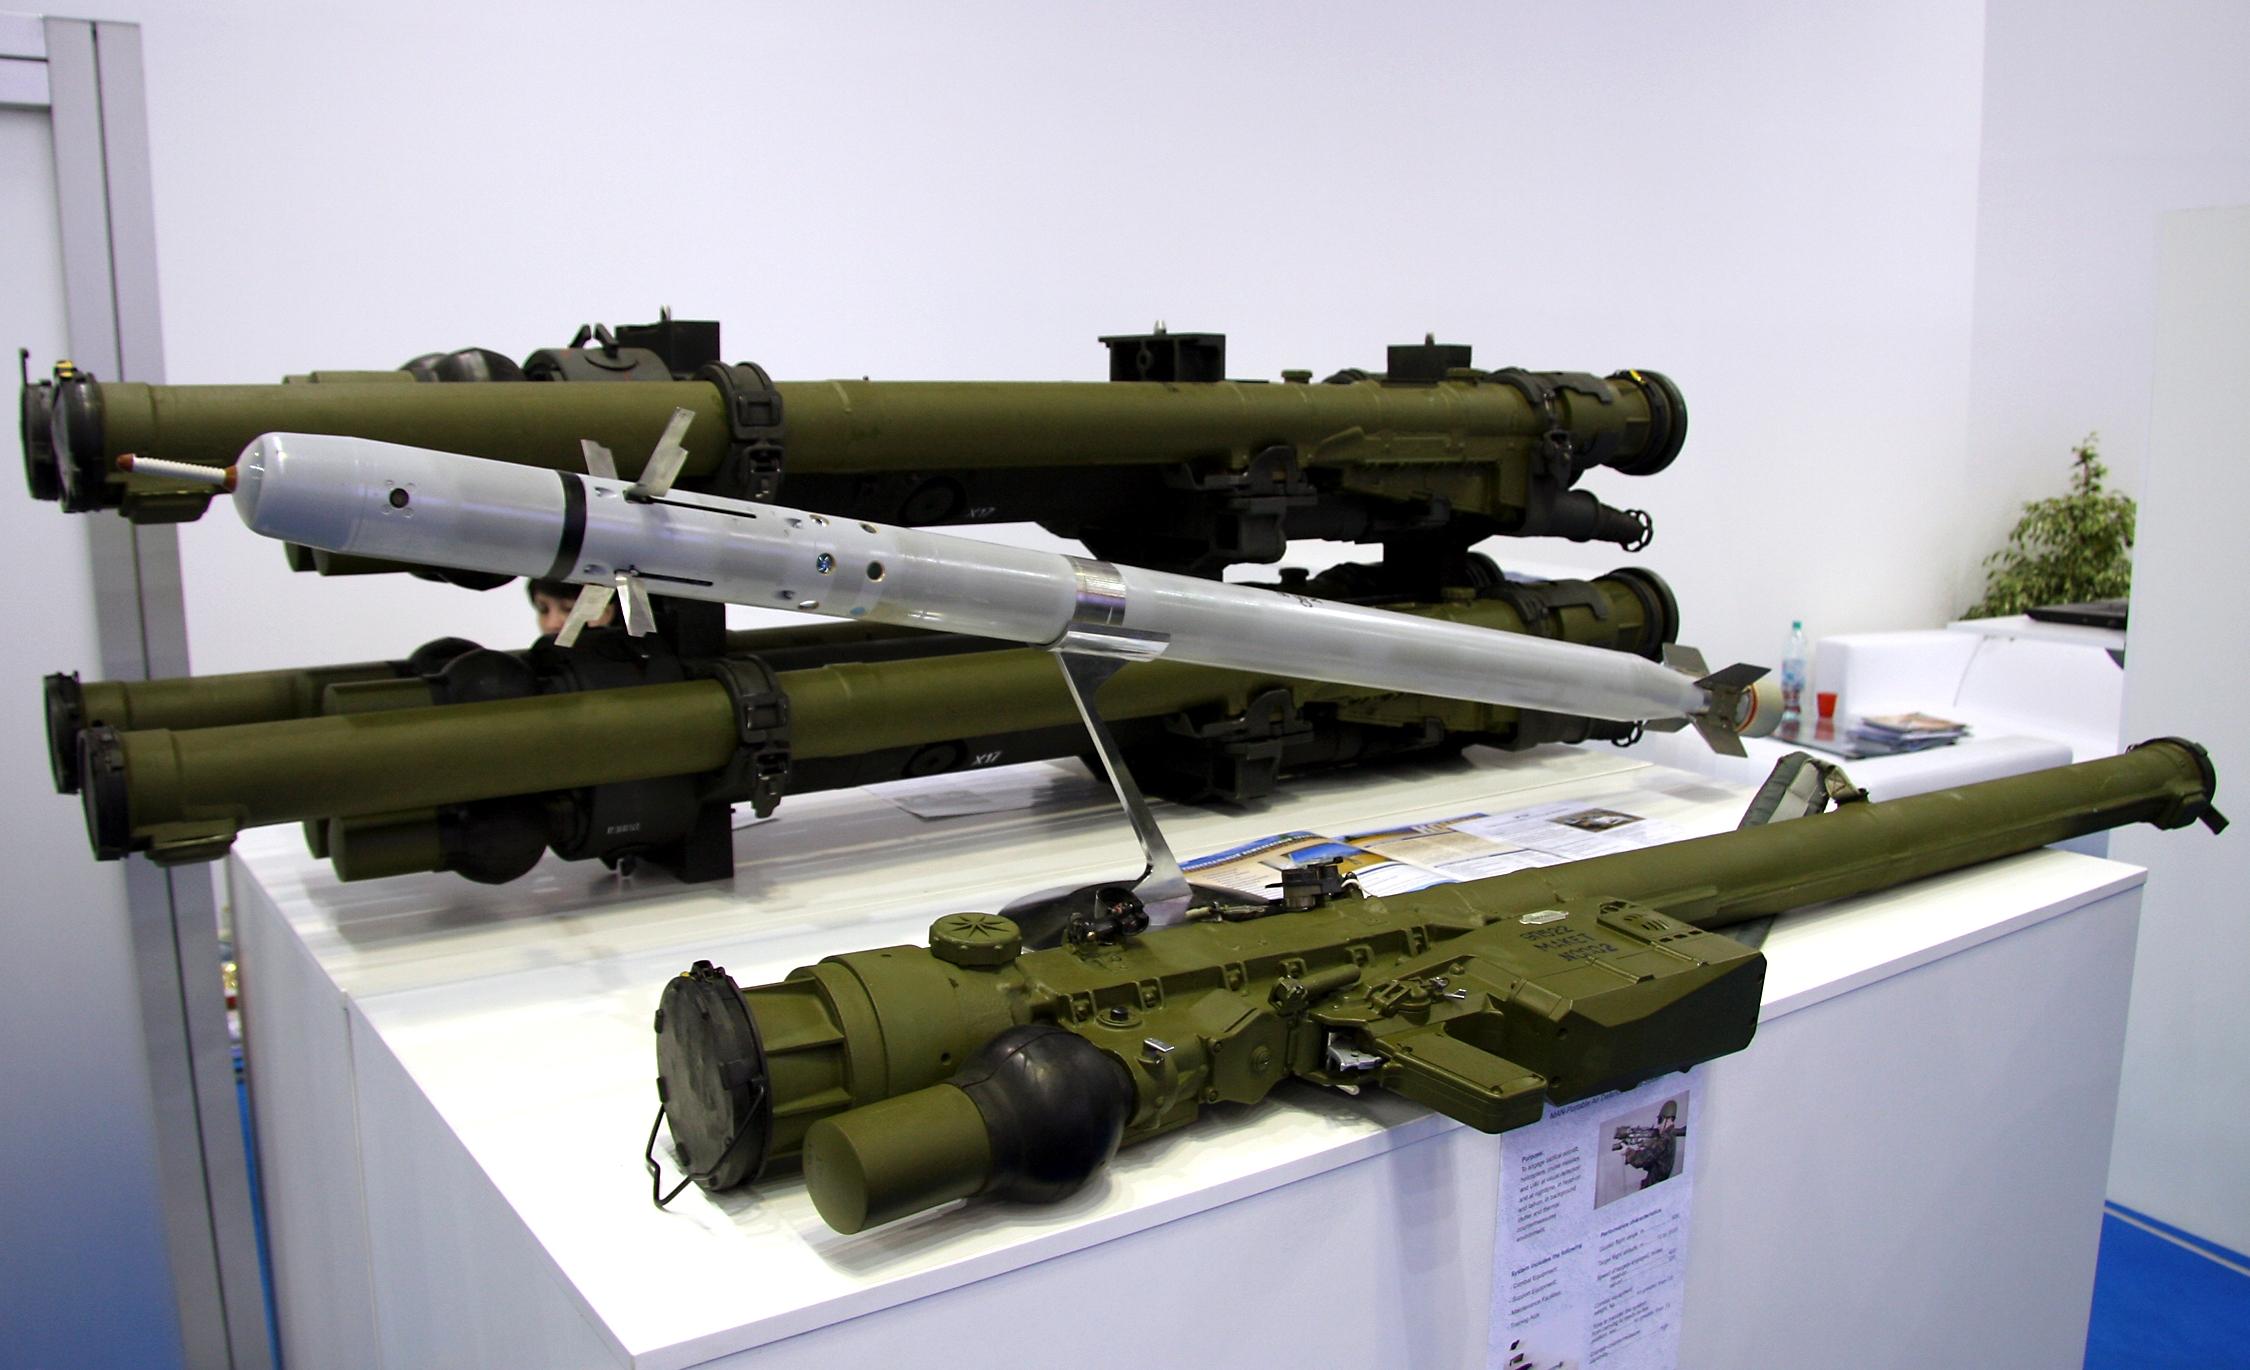 Piezas ZU-23-2/2A13 (ZU-23/ZOM-1-4) de 23mm 9K338_Igla-S_%28NATO-Code_-_SA-24_Grinch%29